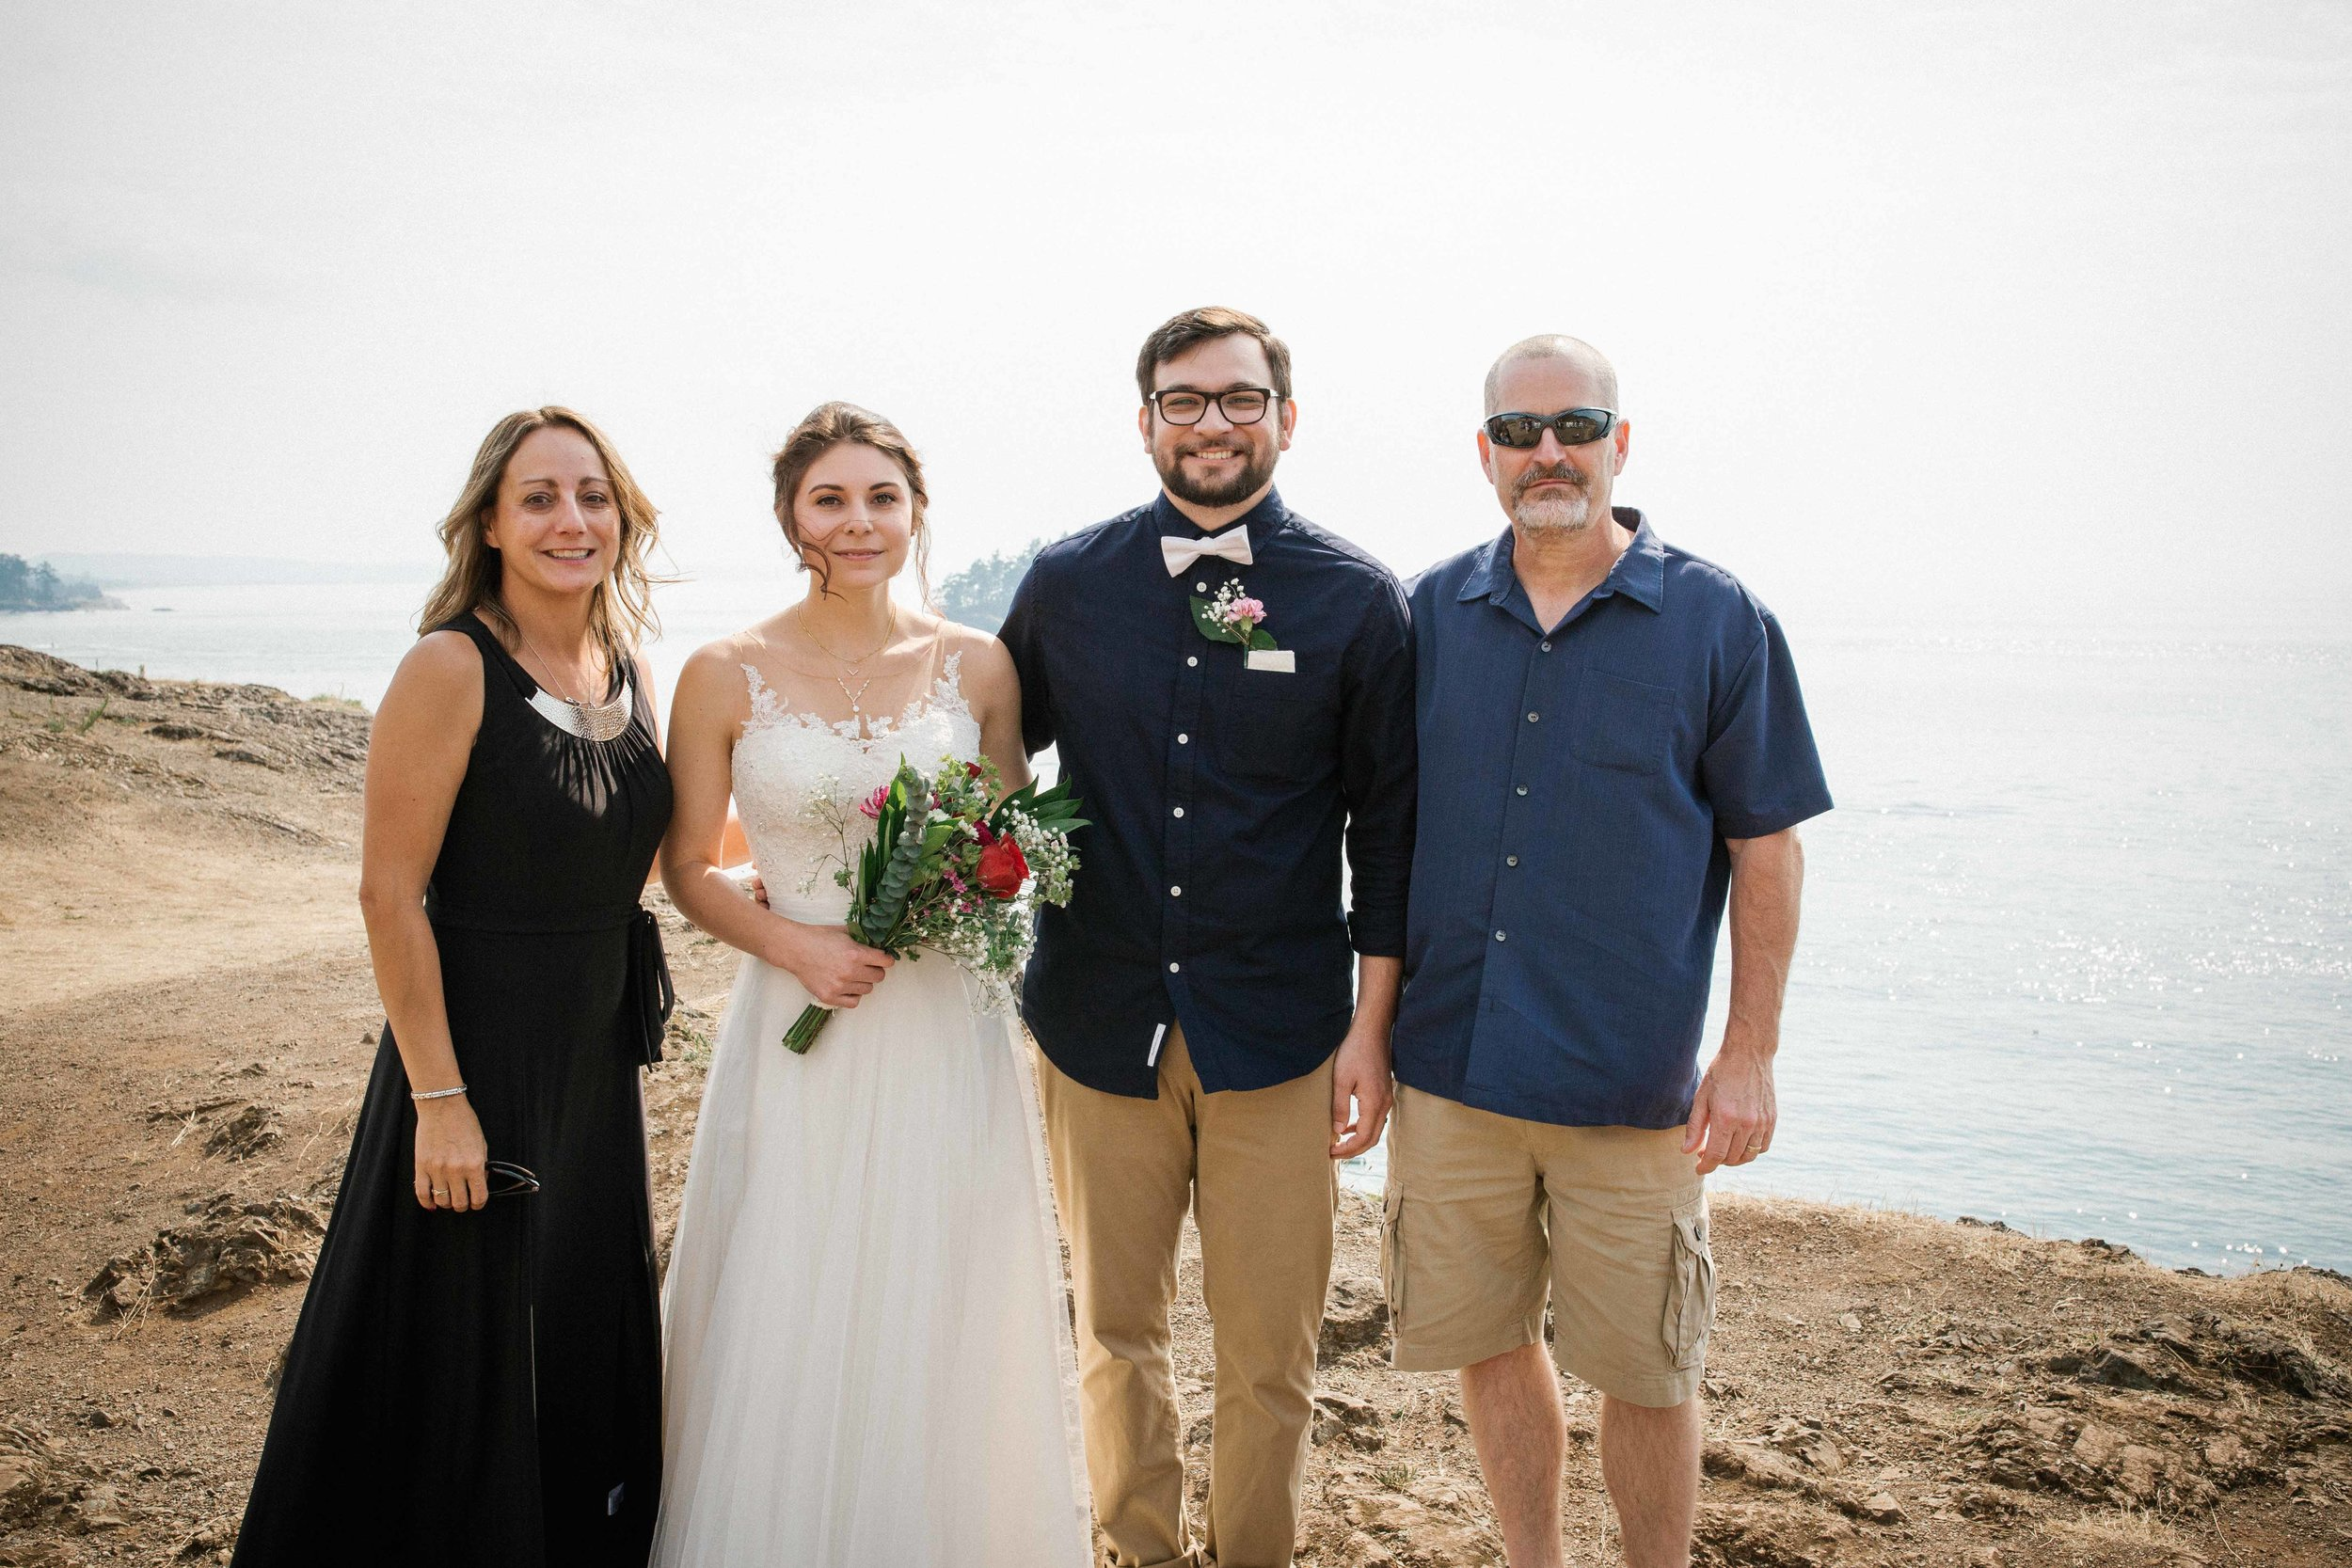 deception-pass-wedding-38.jpg